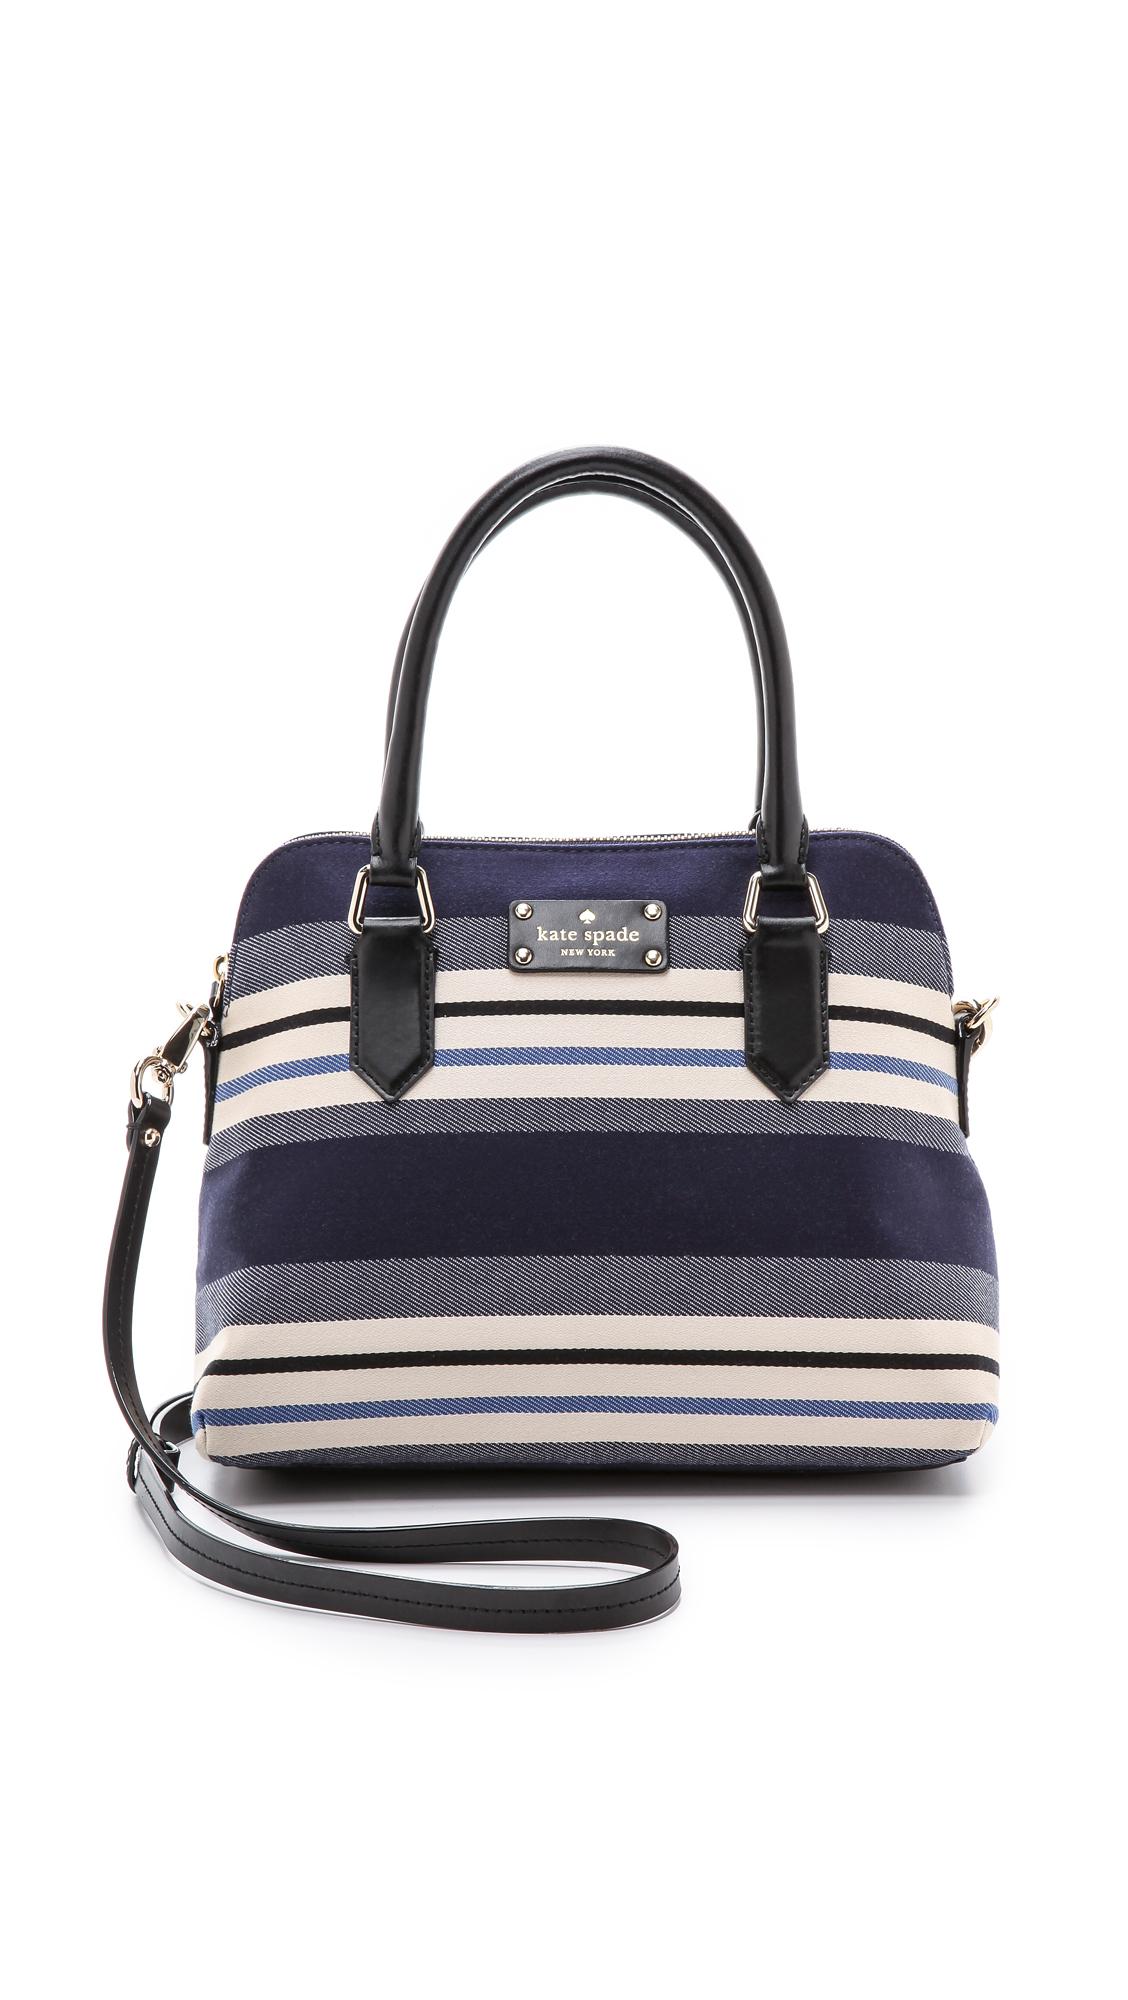 Kate Spade Striped Handbag - ShopStyle